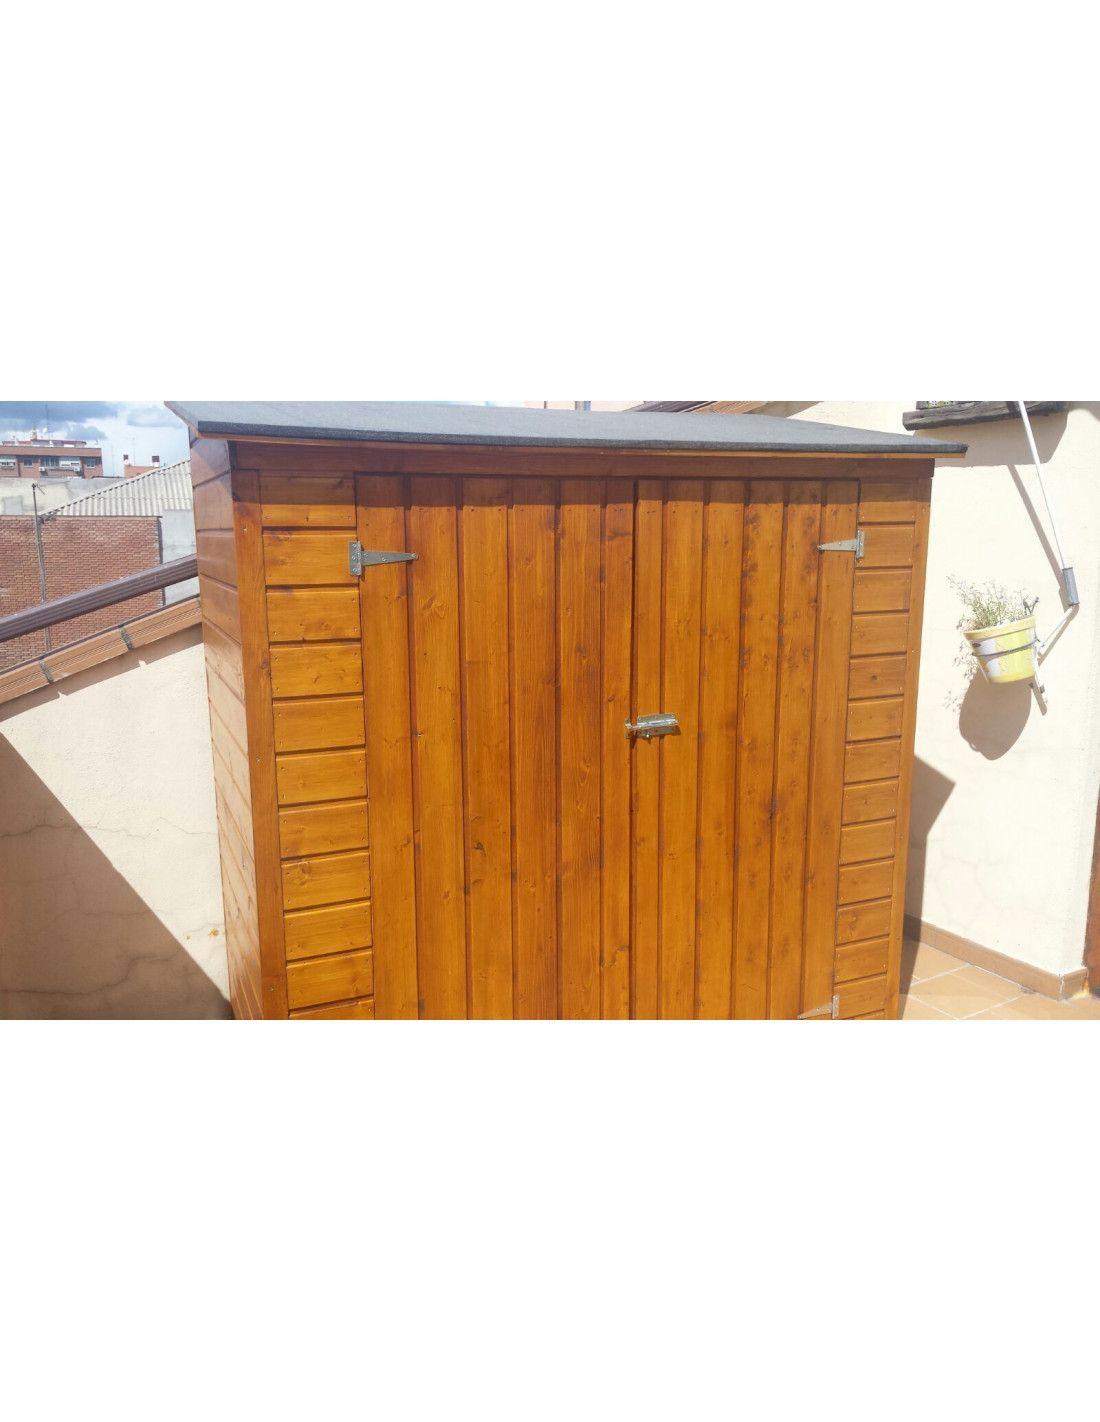 Adesivo Decorativo Para Vidro ~ Armarios de exterior en madera prefabricados mod Albecove